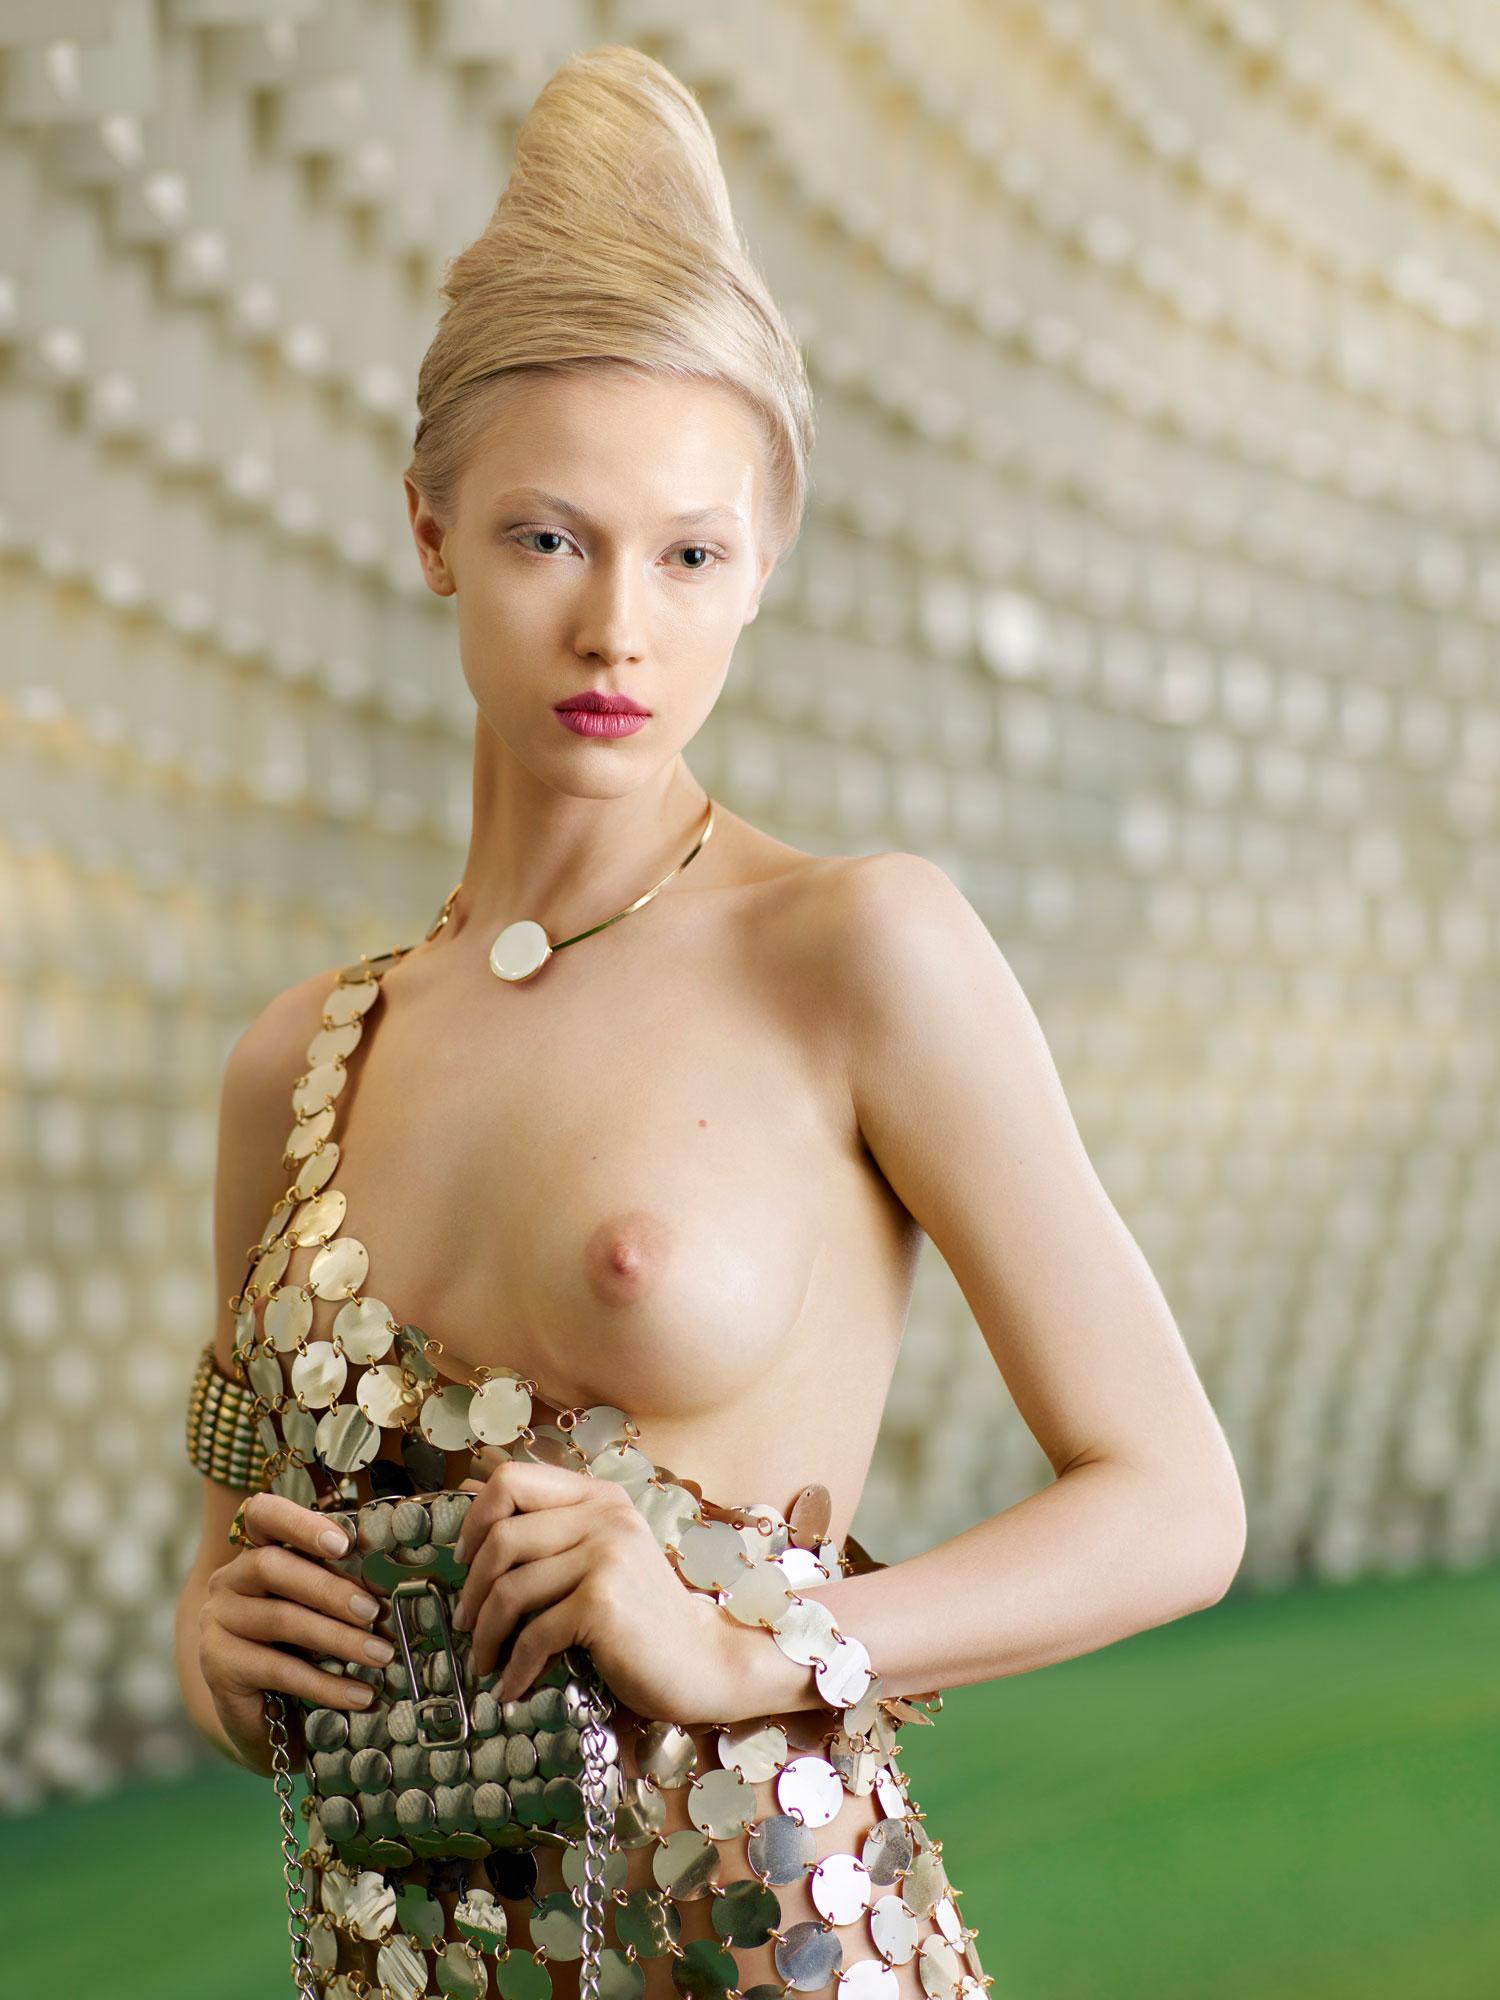 Eve 2673, Secret Eden, 2016, photography, 90 x 67,52 cm ©Sacha Goldberger courtesy School Gallery:Olivier Castaing.jpg